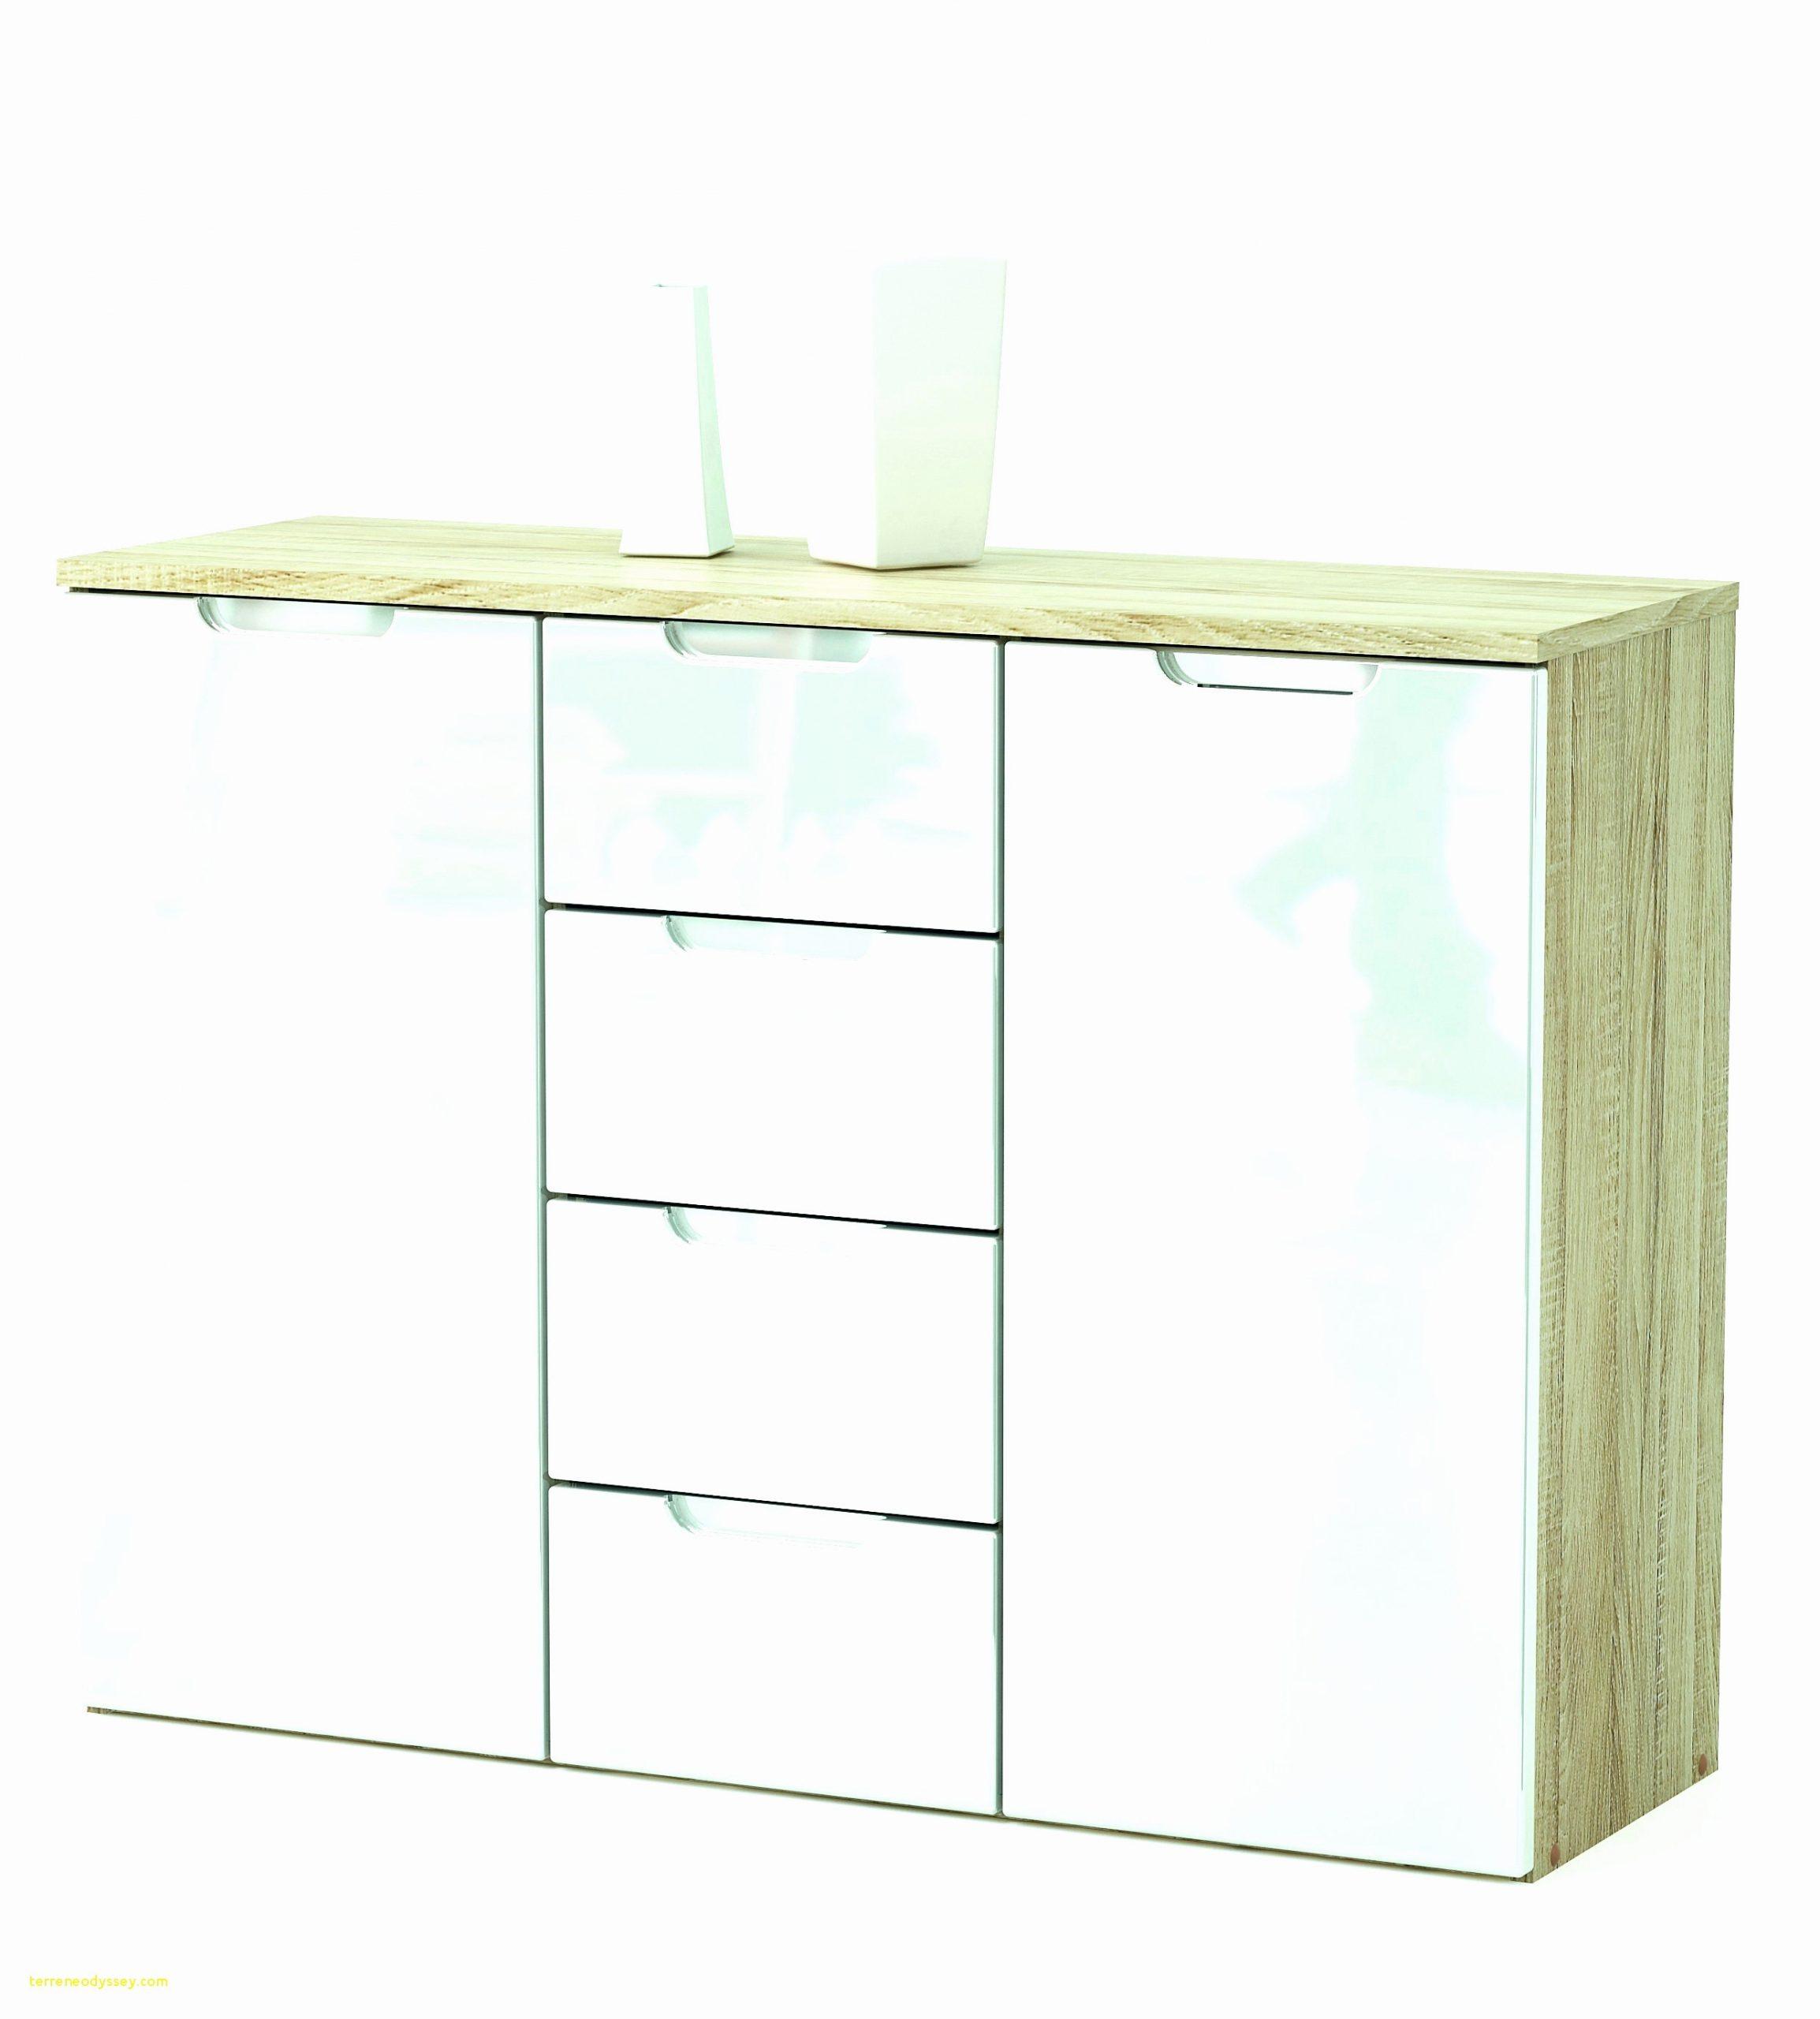 https www agencecormierdelauniere com petit meuble dangle conforama conforama petit meuble meuble d angle conforama petit meuble a petit meuble dangle conforama